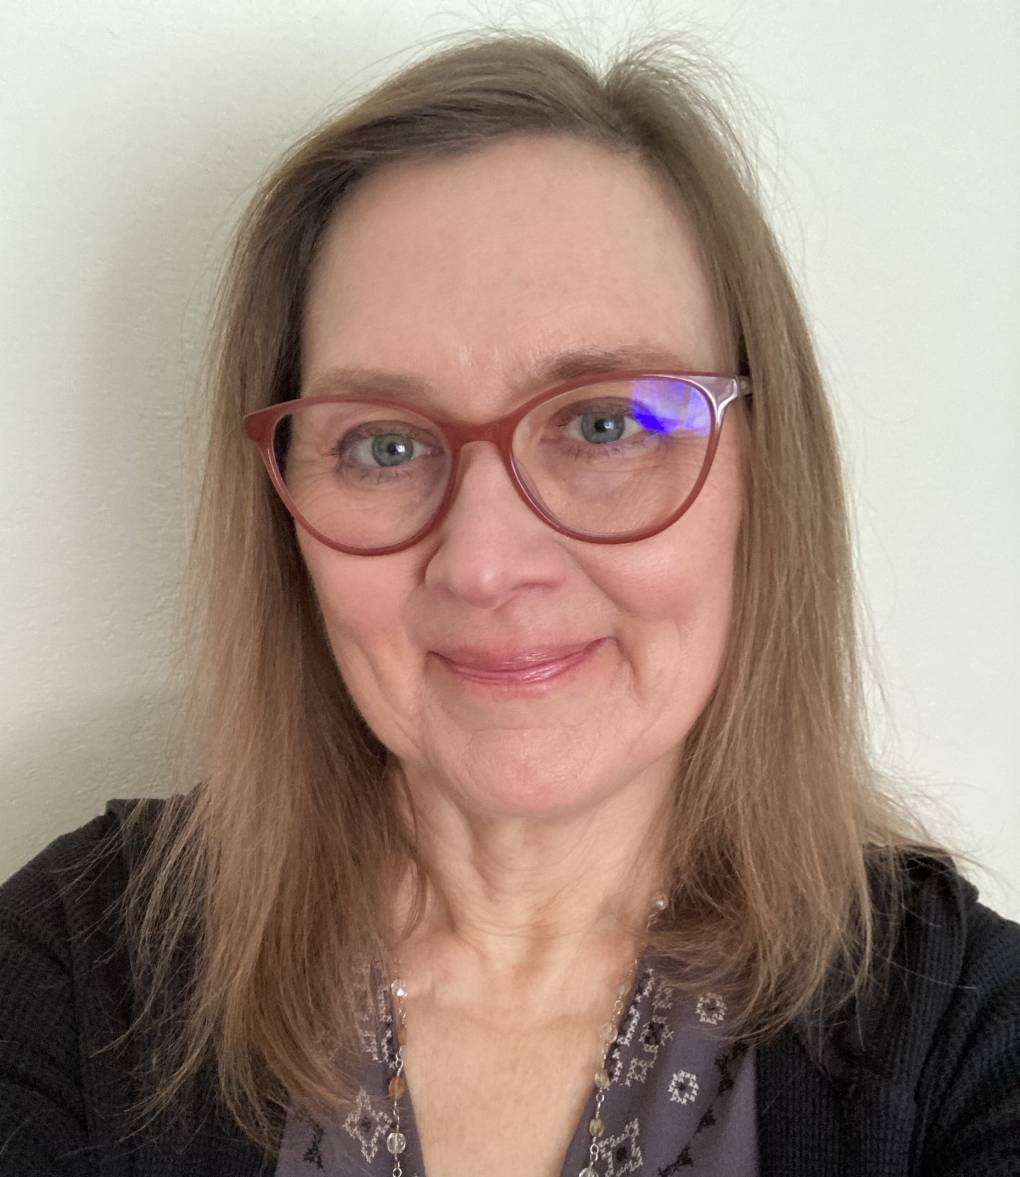 Margaret Stawowy